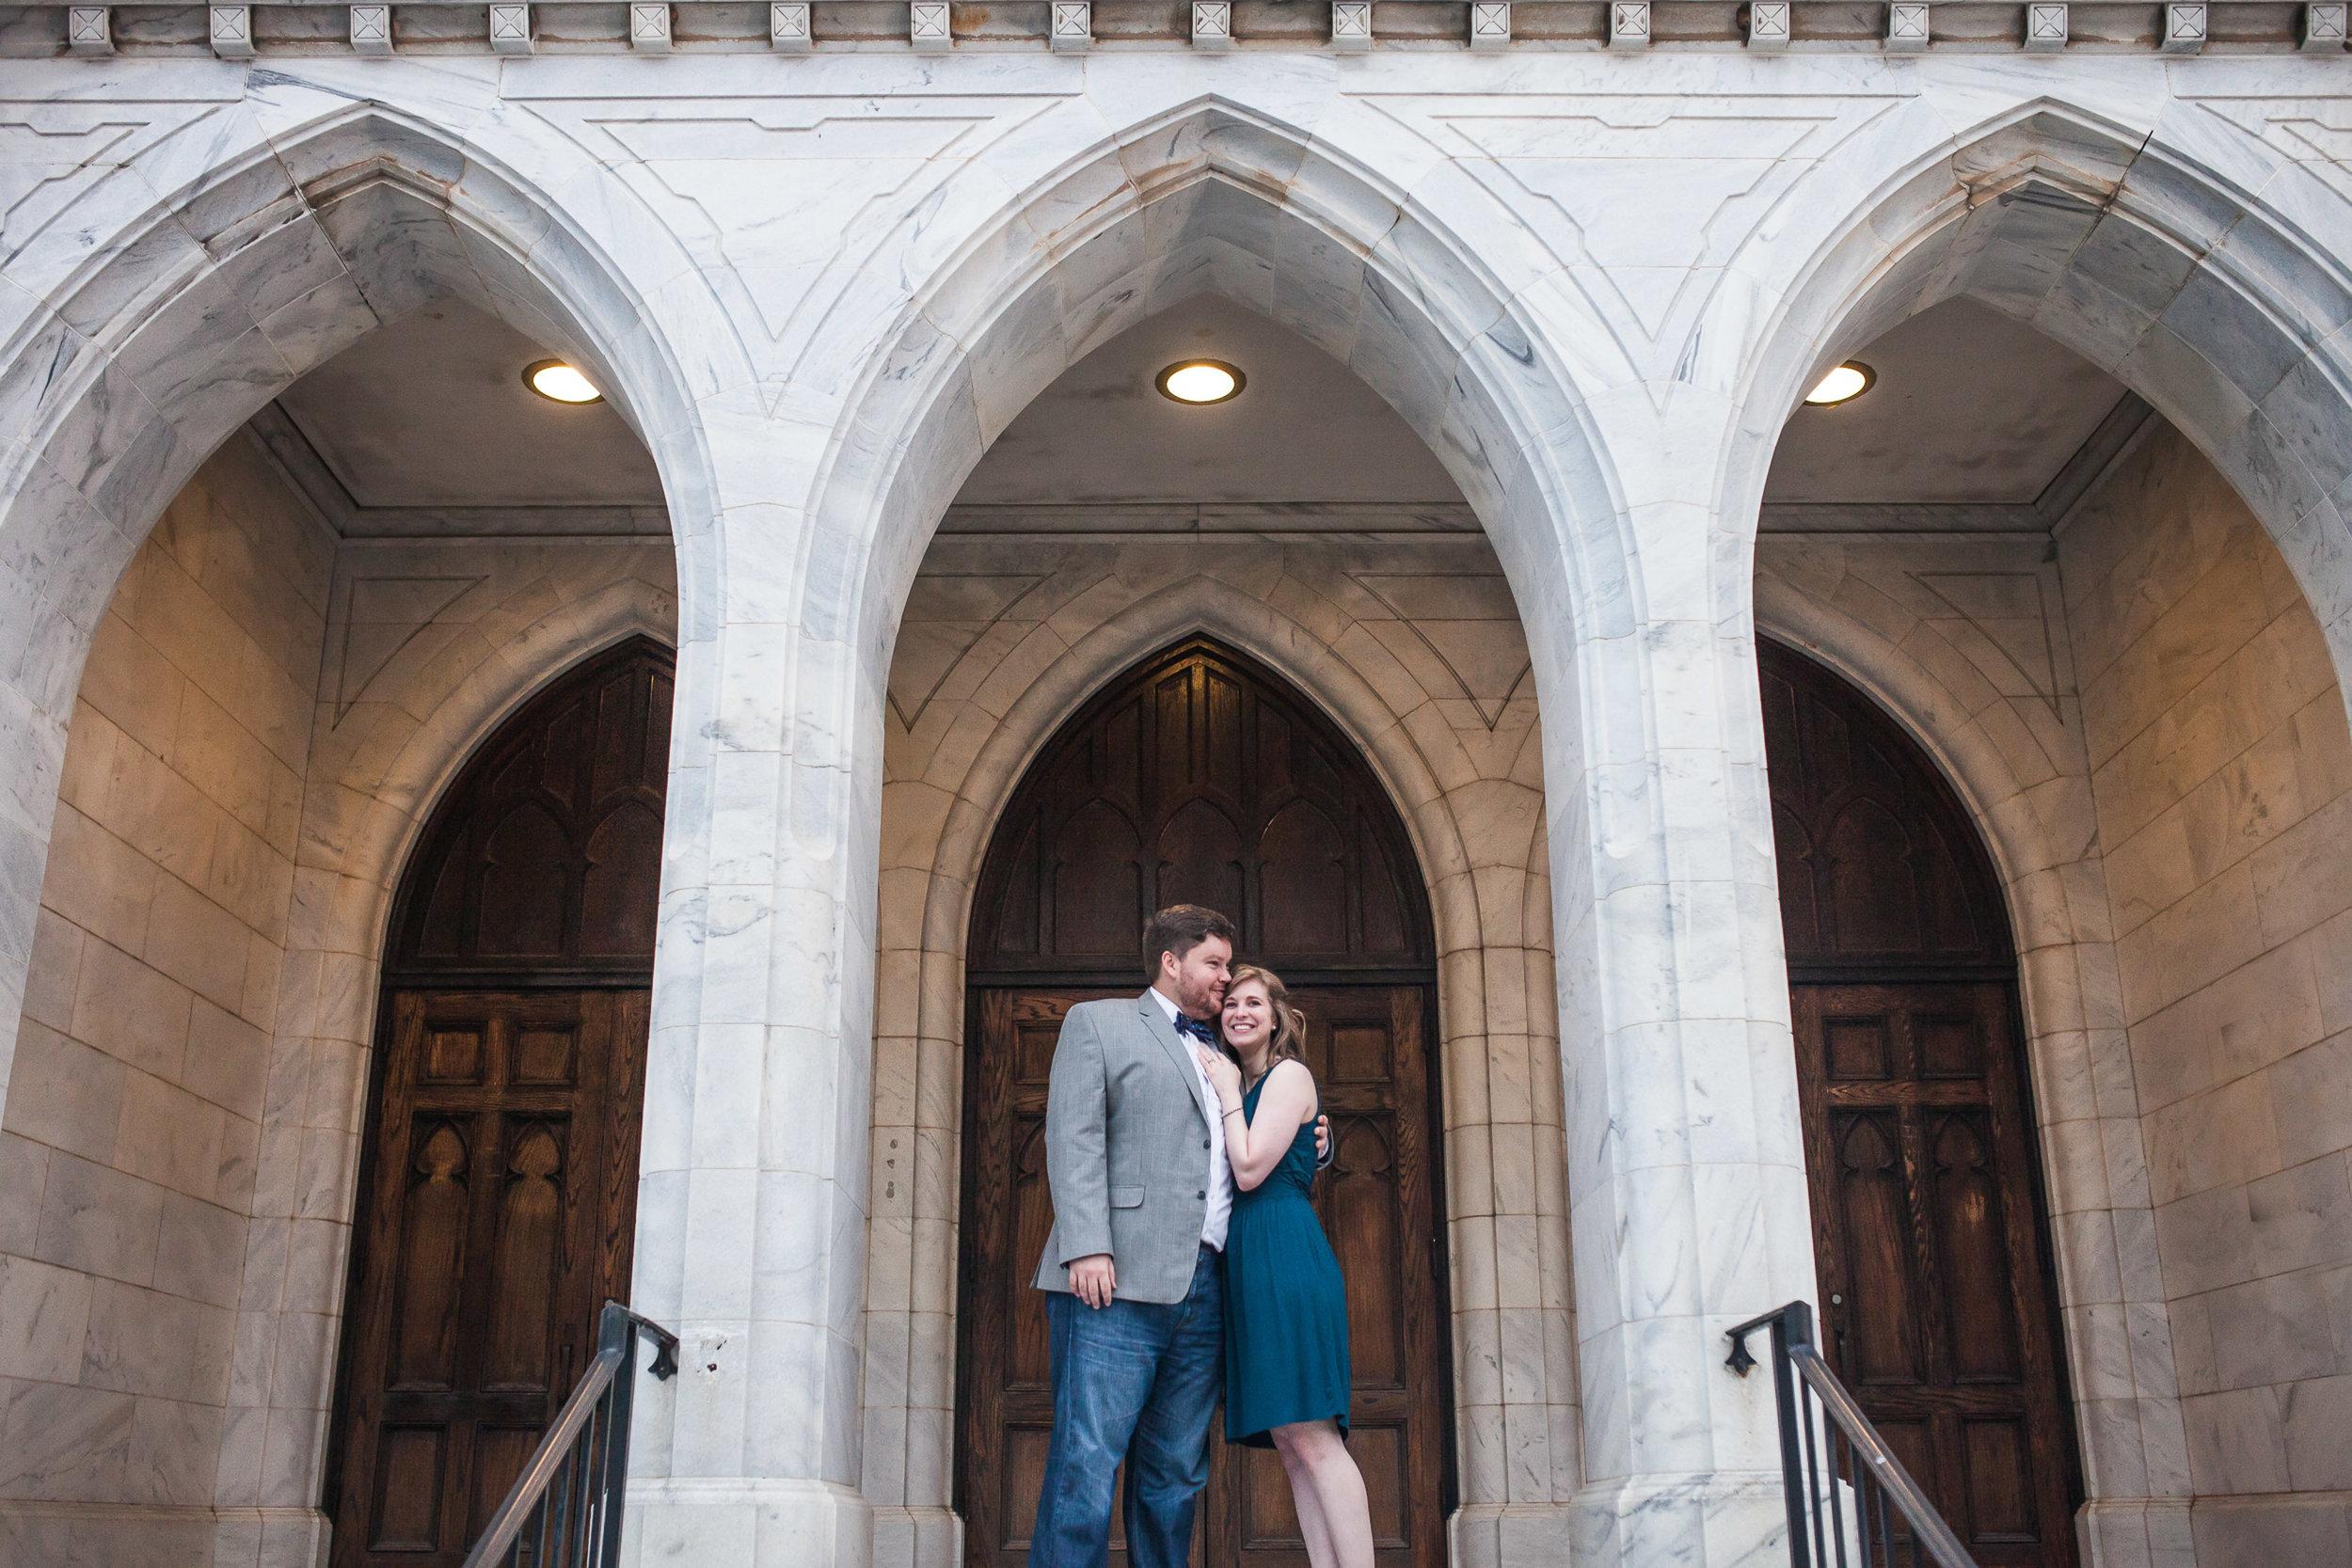 North-Georgia-Atlanta-Wedding-Brianna-Joseph-Photography-77.jpg